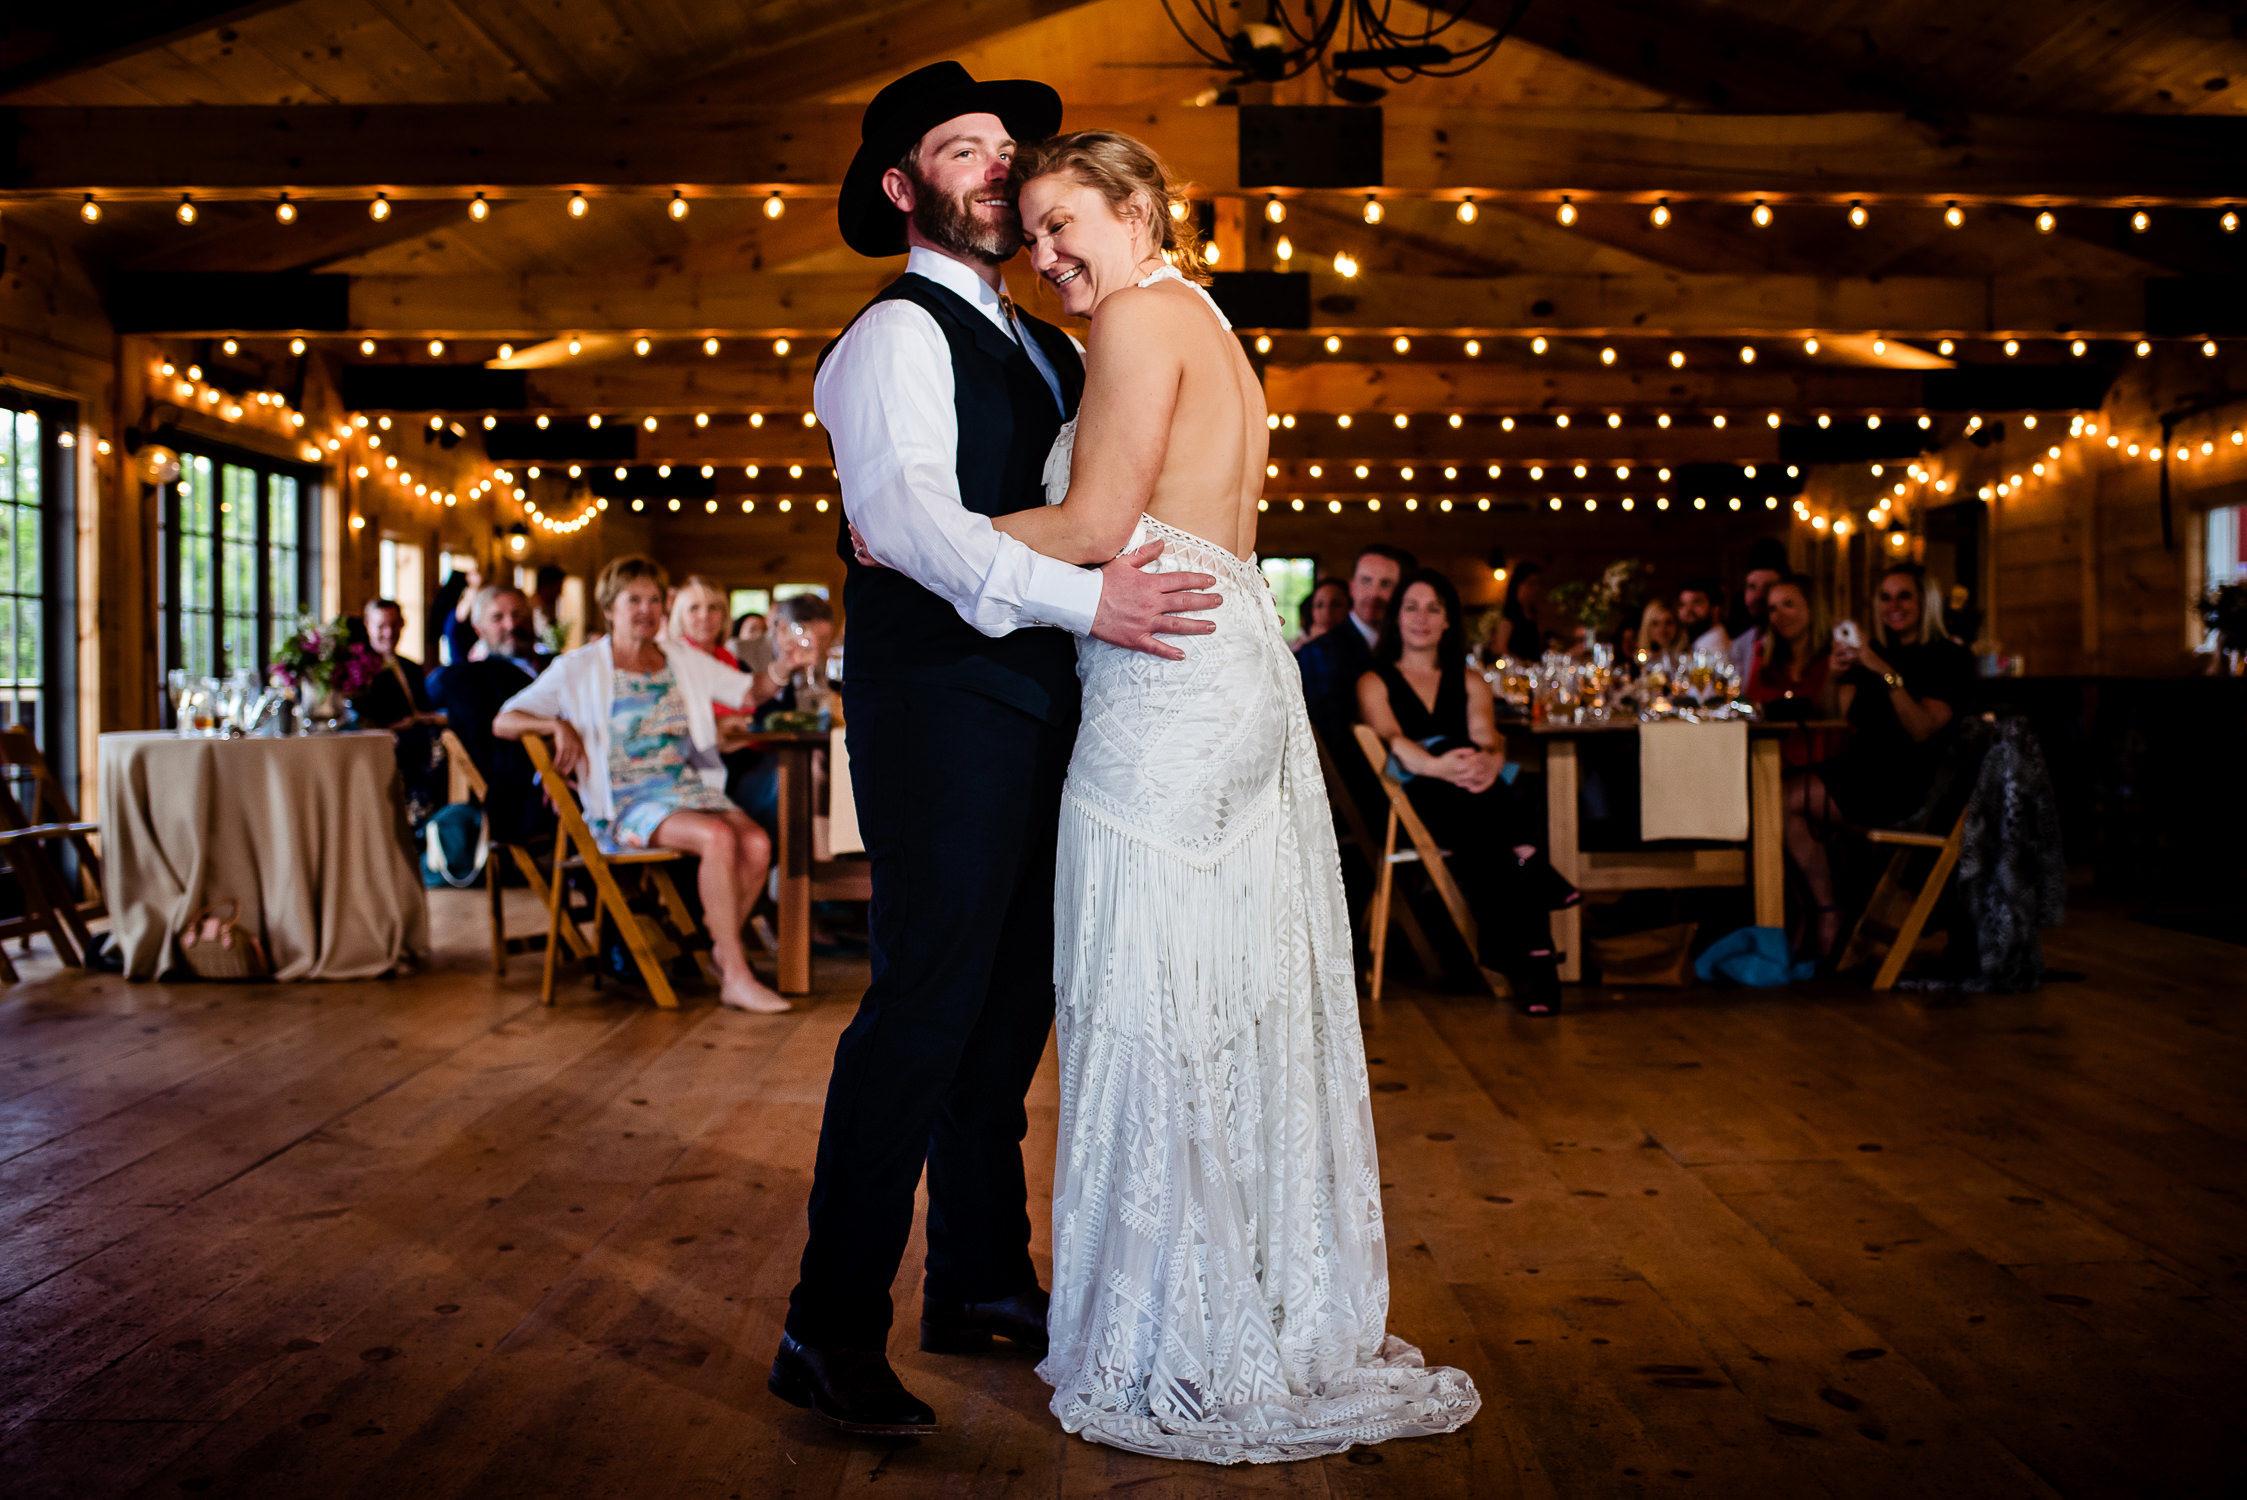 tourterelle-vermont-wedding-photographers-037-2-2247x1500.jpg